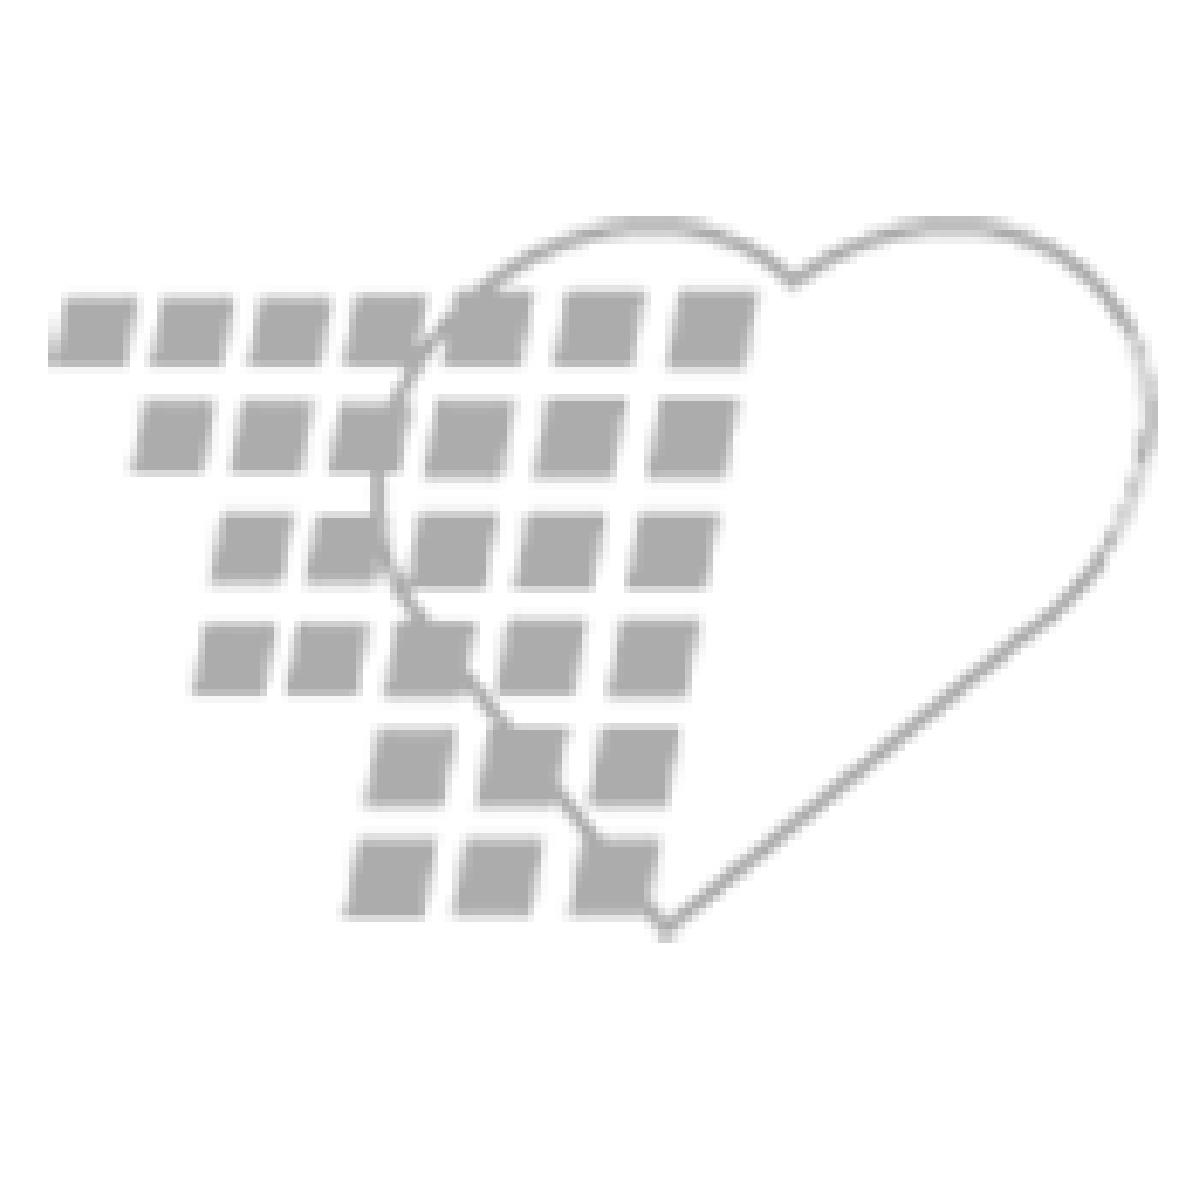 10-81-0934P Nasco Life/form® Pressure Ulcer/Bedsore Models